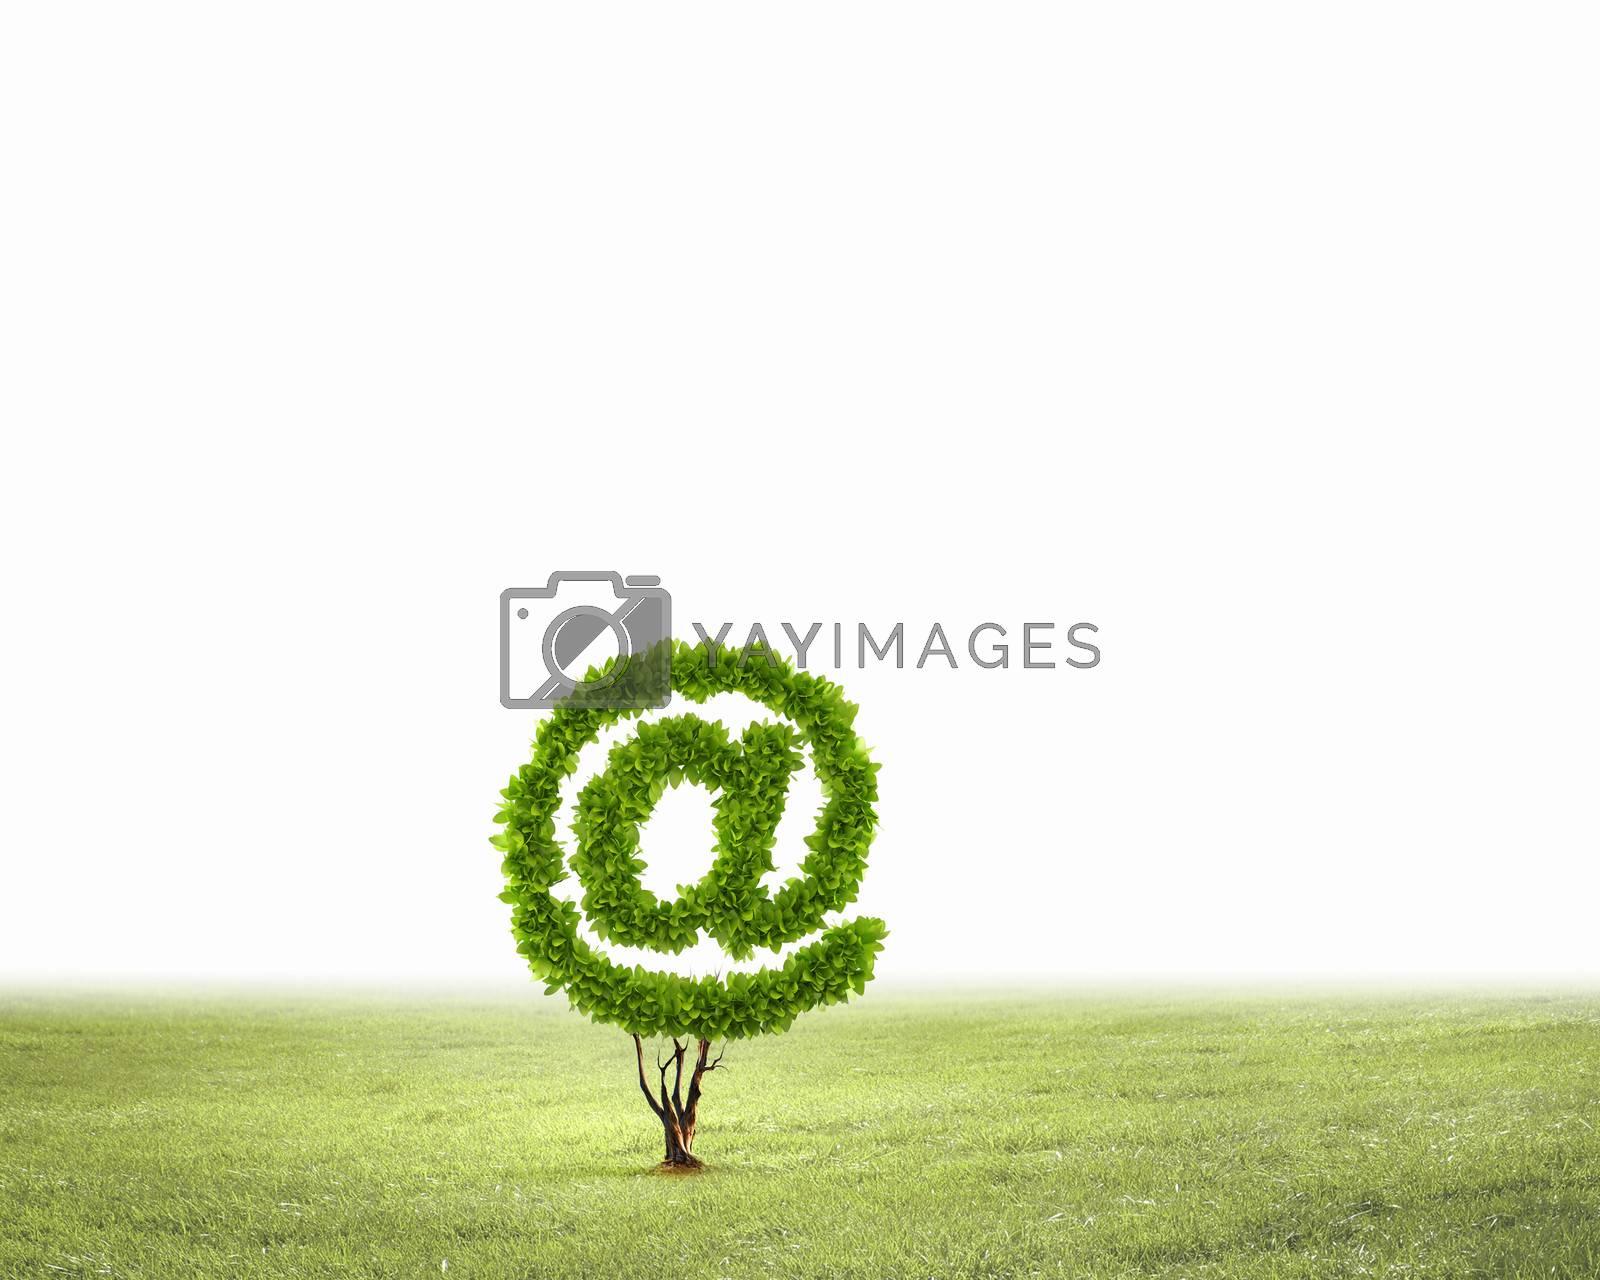 Image of plant shaped like at symbol